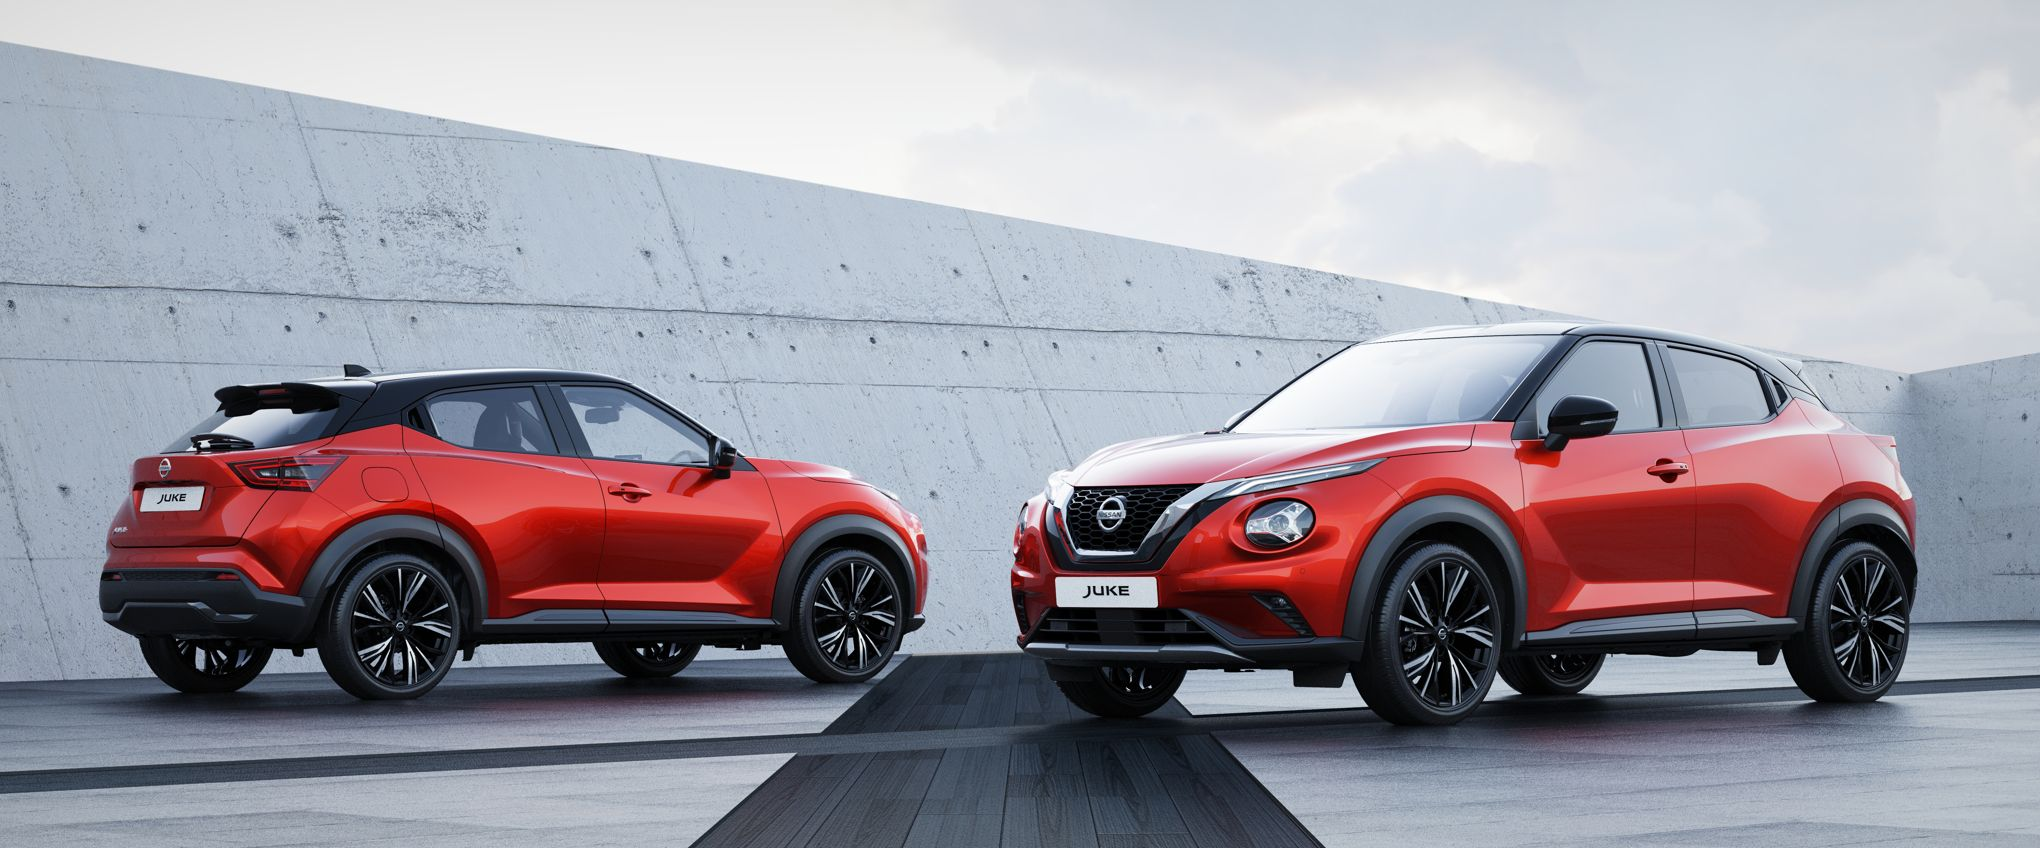 Nissan Juke, acte II